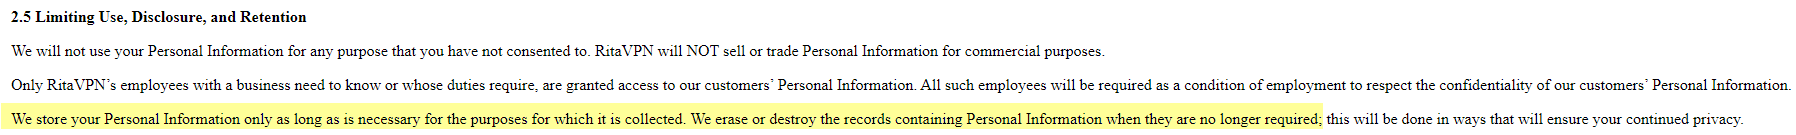 Rita VPN data retention